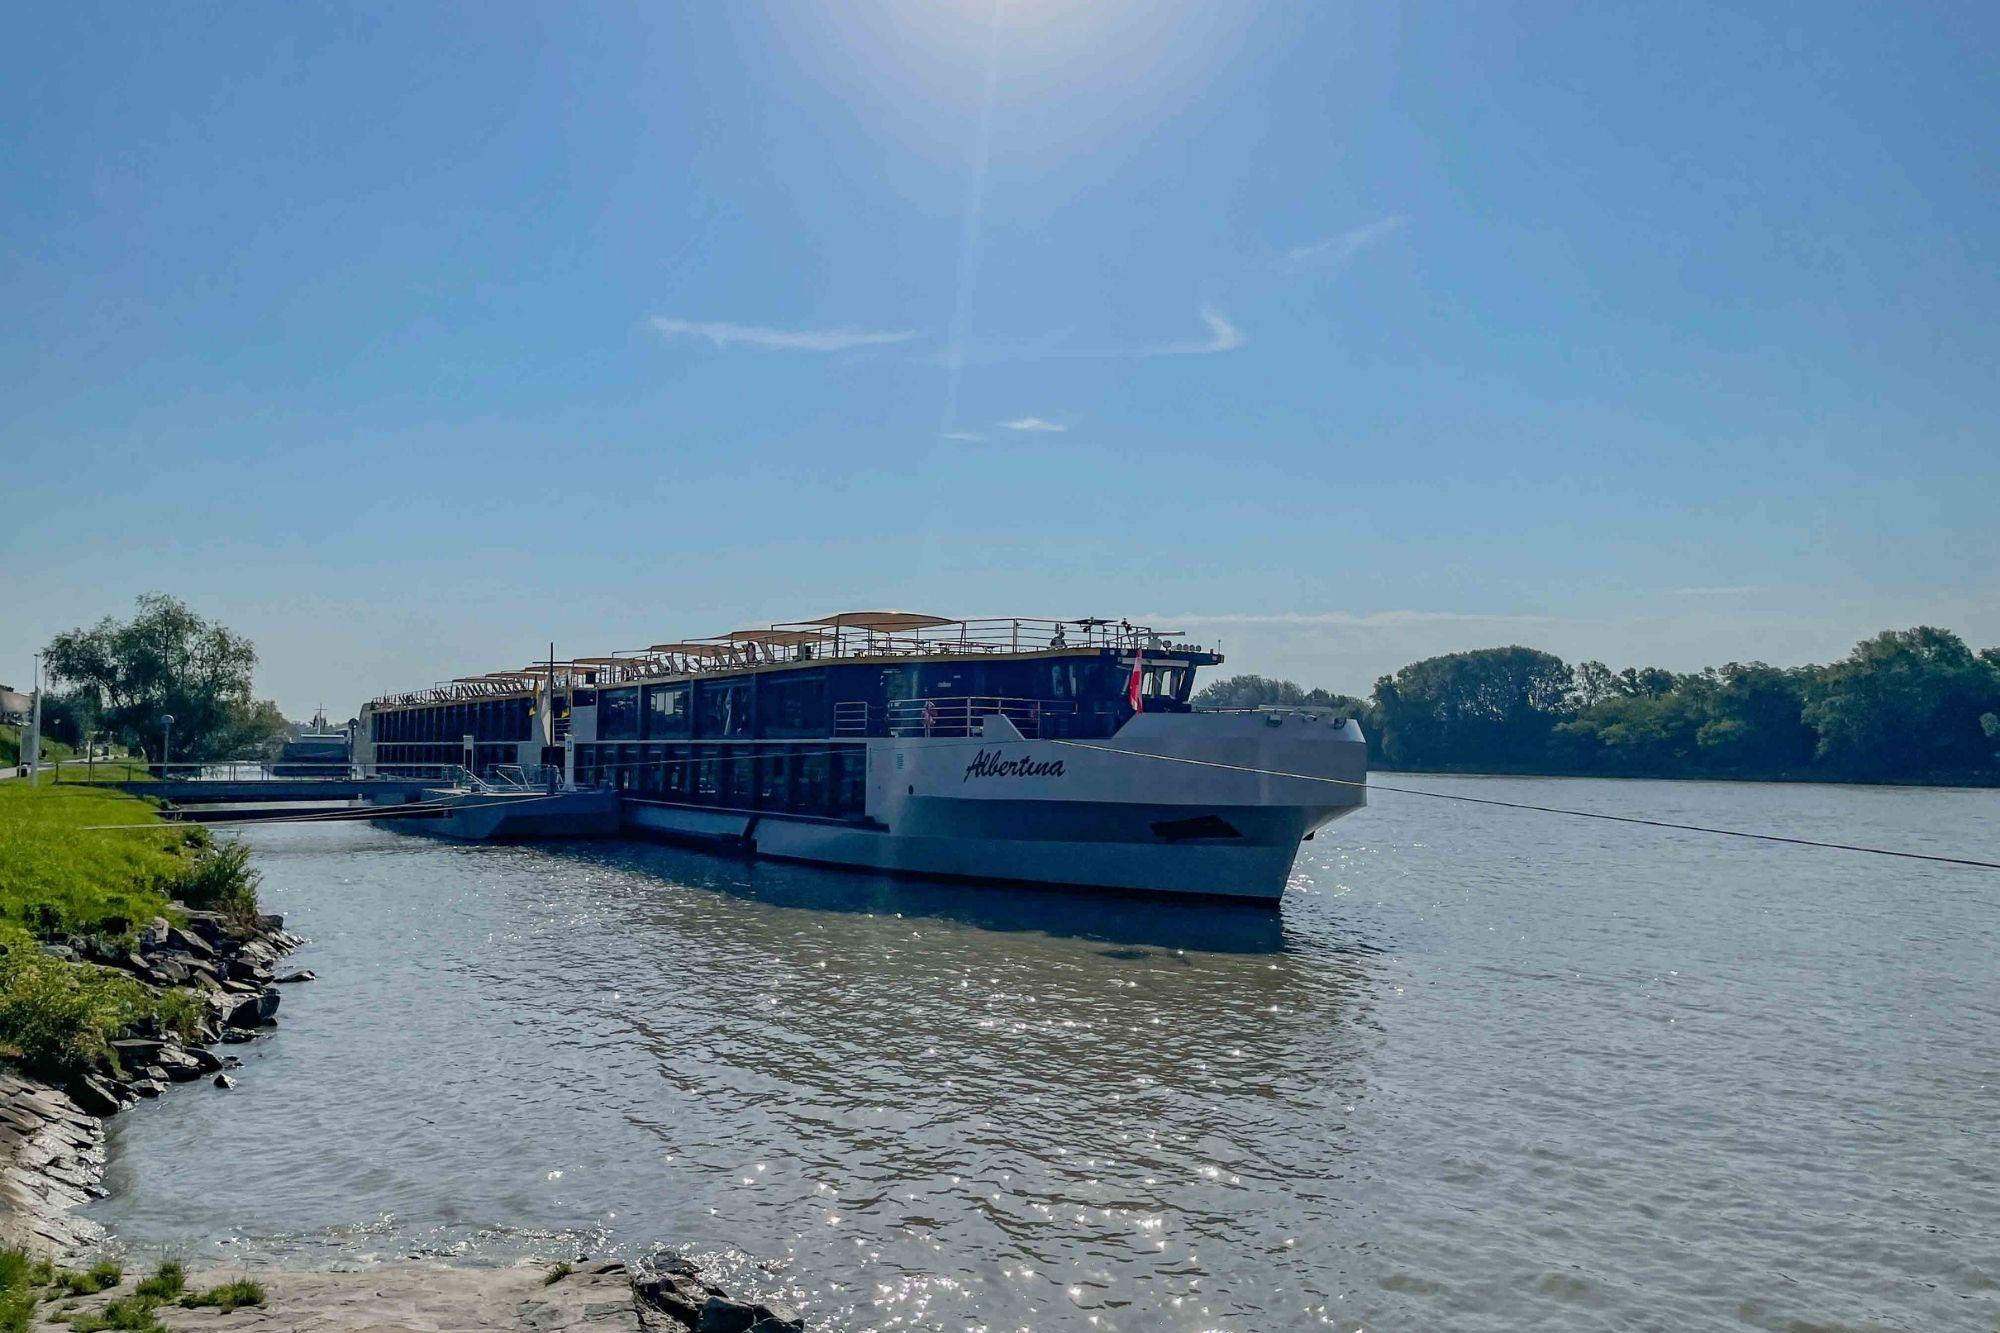 MS ALBERTINA Reisebericht Teil 4: Vormittag in Krems & Gala-Abend an Bord